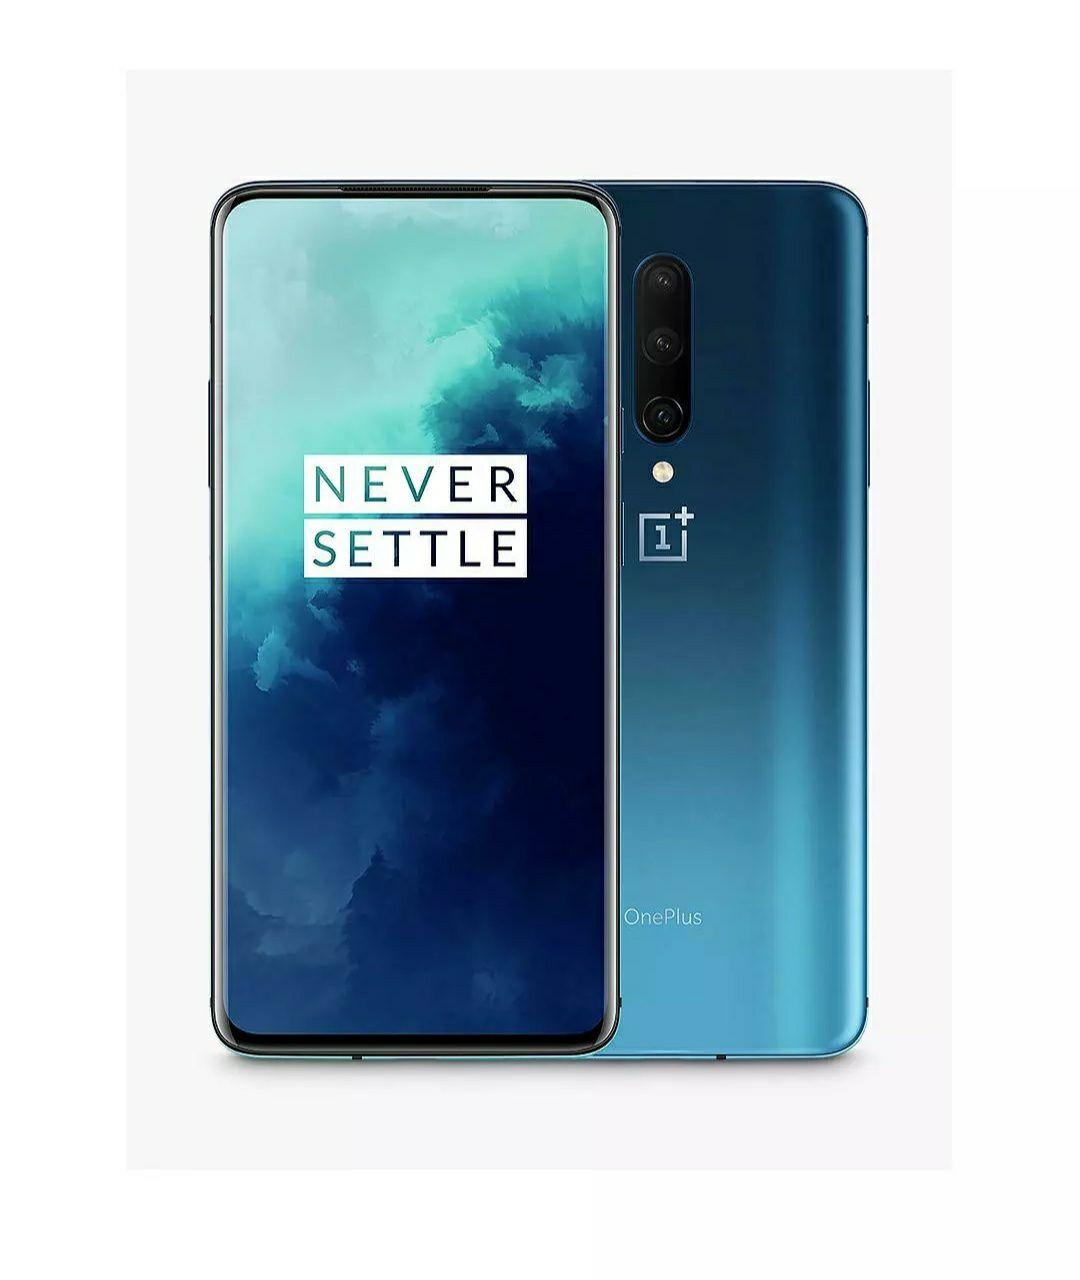 "Grade B OnePlus 7T Pro Smartphone, 6.67"", SIM Free, 8GB RAM, 256GB Haze blue (ML4096) £499.99 @ Stock Must Go Ebay"